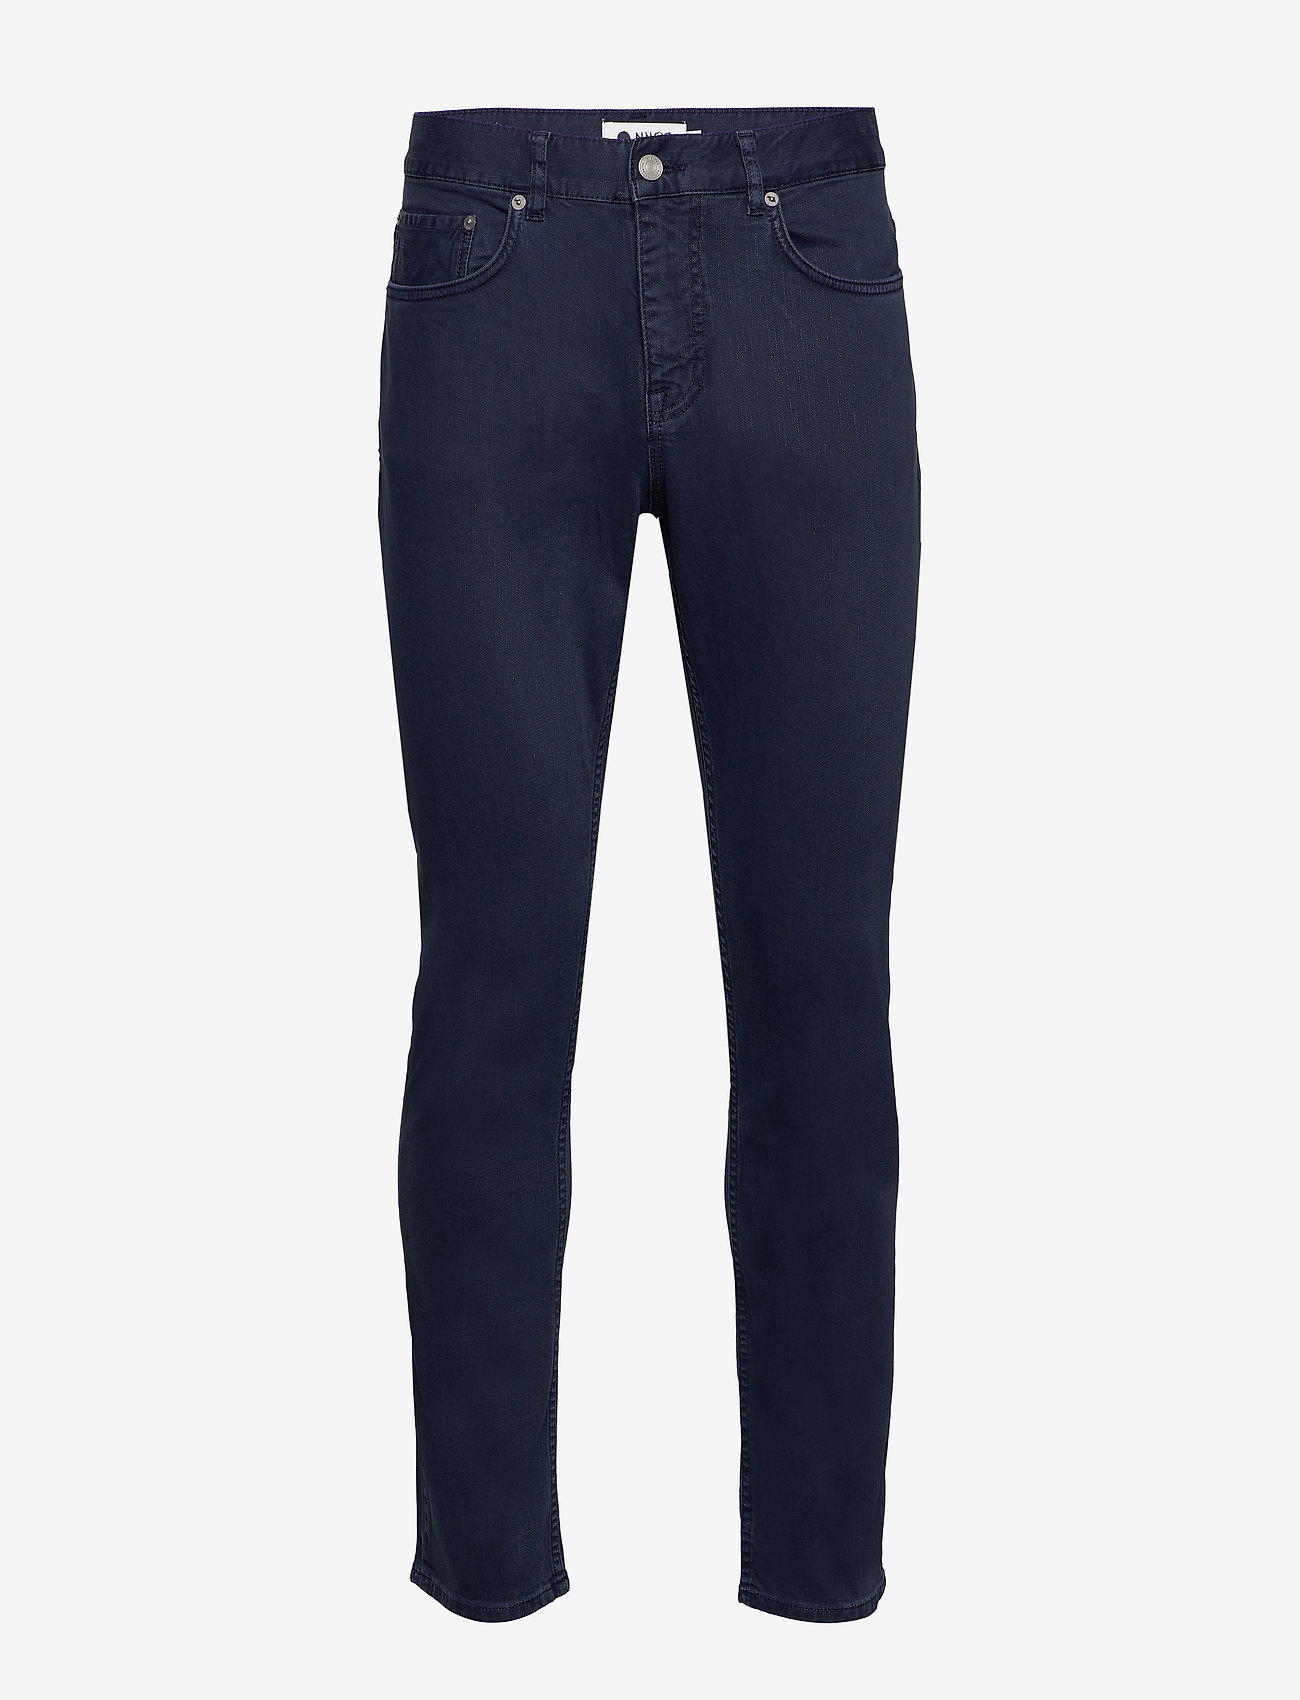 NN07 - Wilson 1819 L30 - slim jeans - navy blue - 0